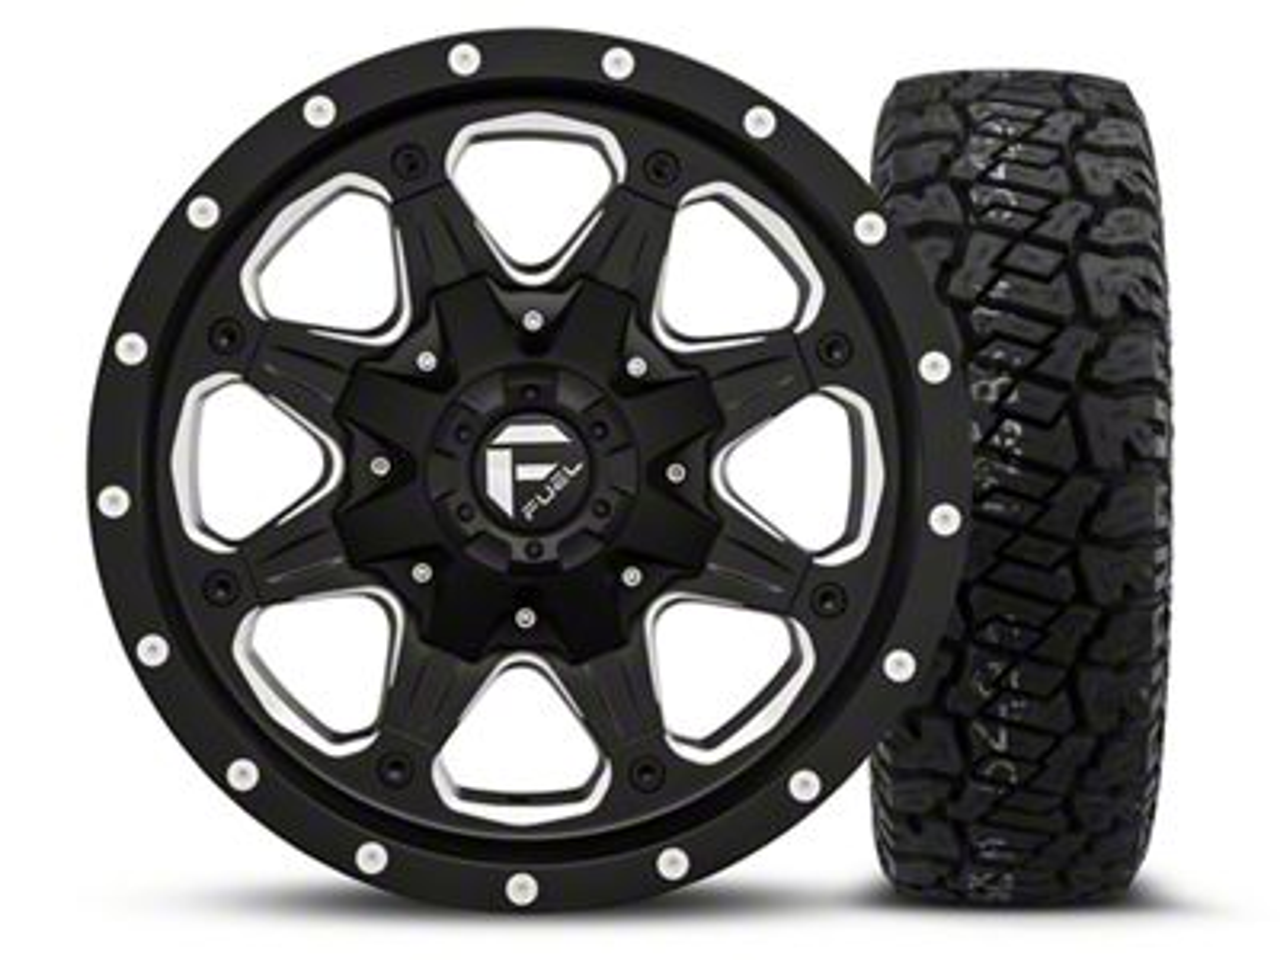 Fuel Wheels Boost - Black/Milled 16x8 Wheel - and Dick Cepek Fun Country Tire - 265/75R16 (07-18 Jeep Wrangler JK; 2018 Jeep Wrangler JL)